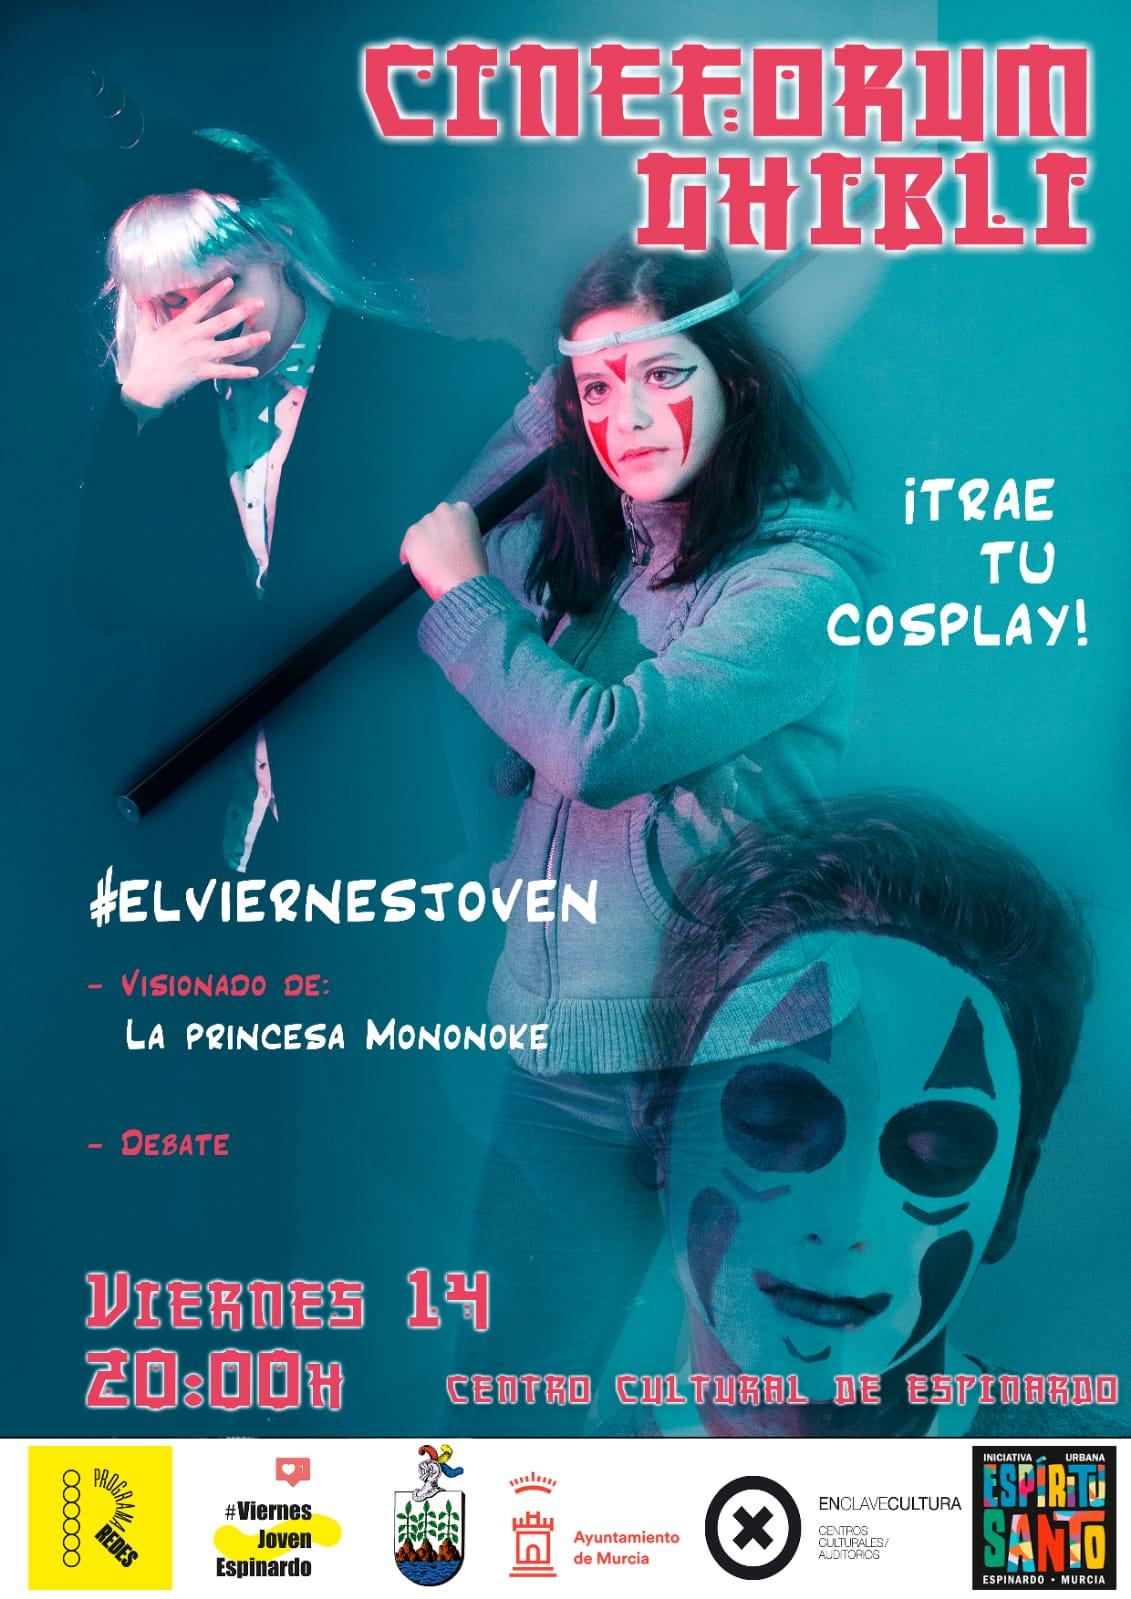 Cartel Cosplay Centro Cultural Espinardo 14-12-2018